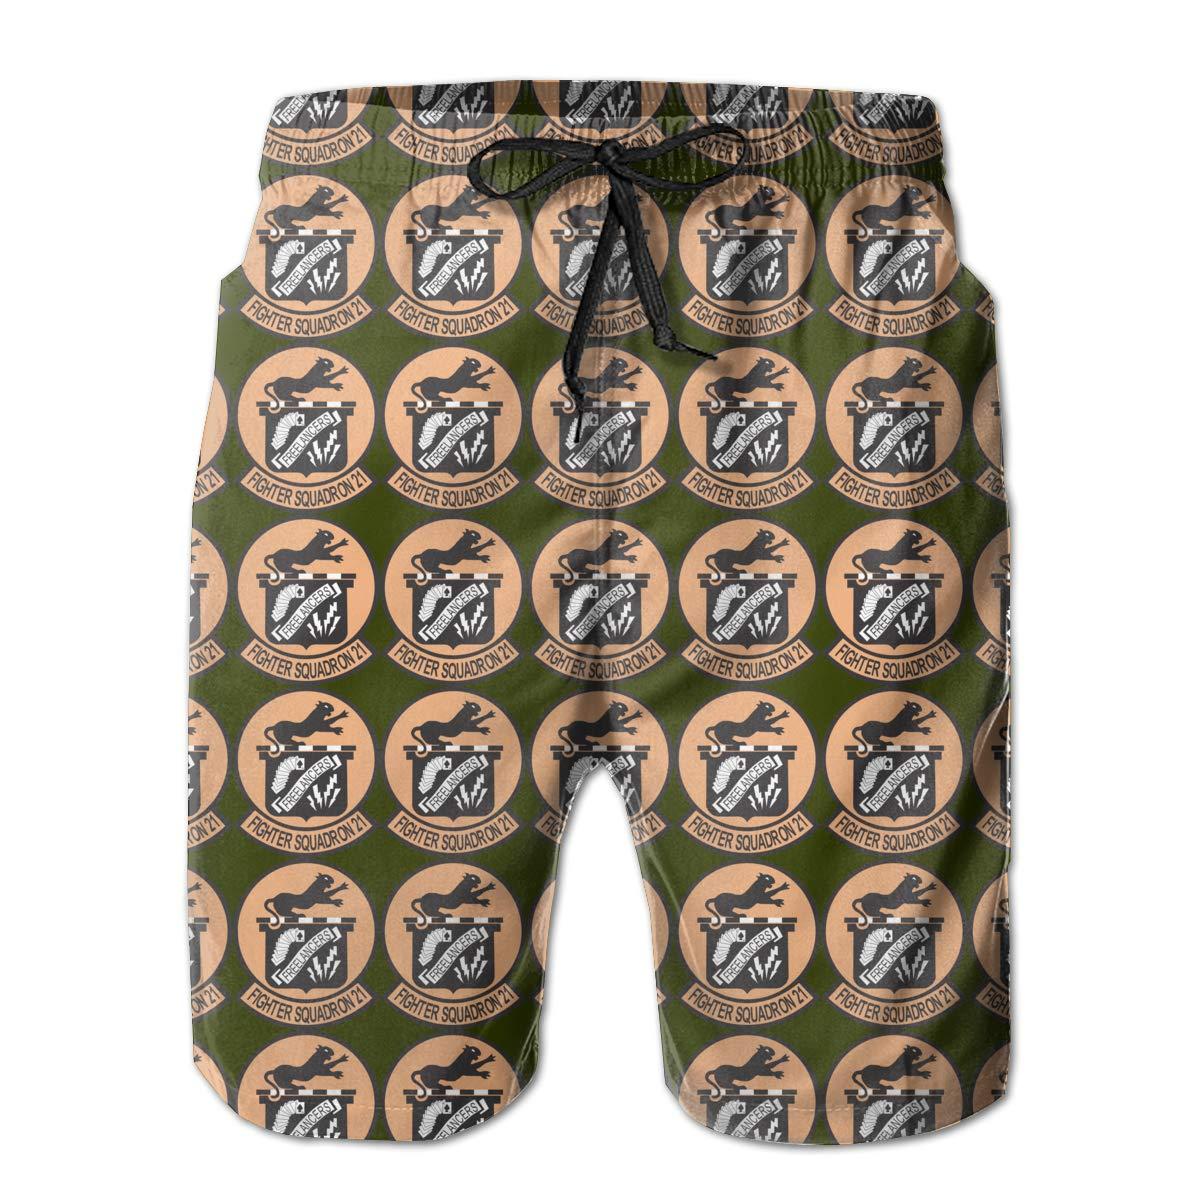 AIYIZHEN VF-21 Freelancers Mens Beach Shorts Swim Trunks Swimsuit